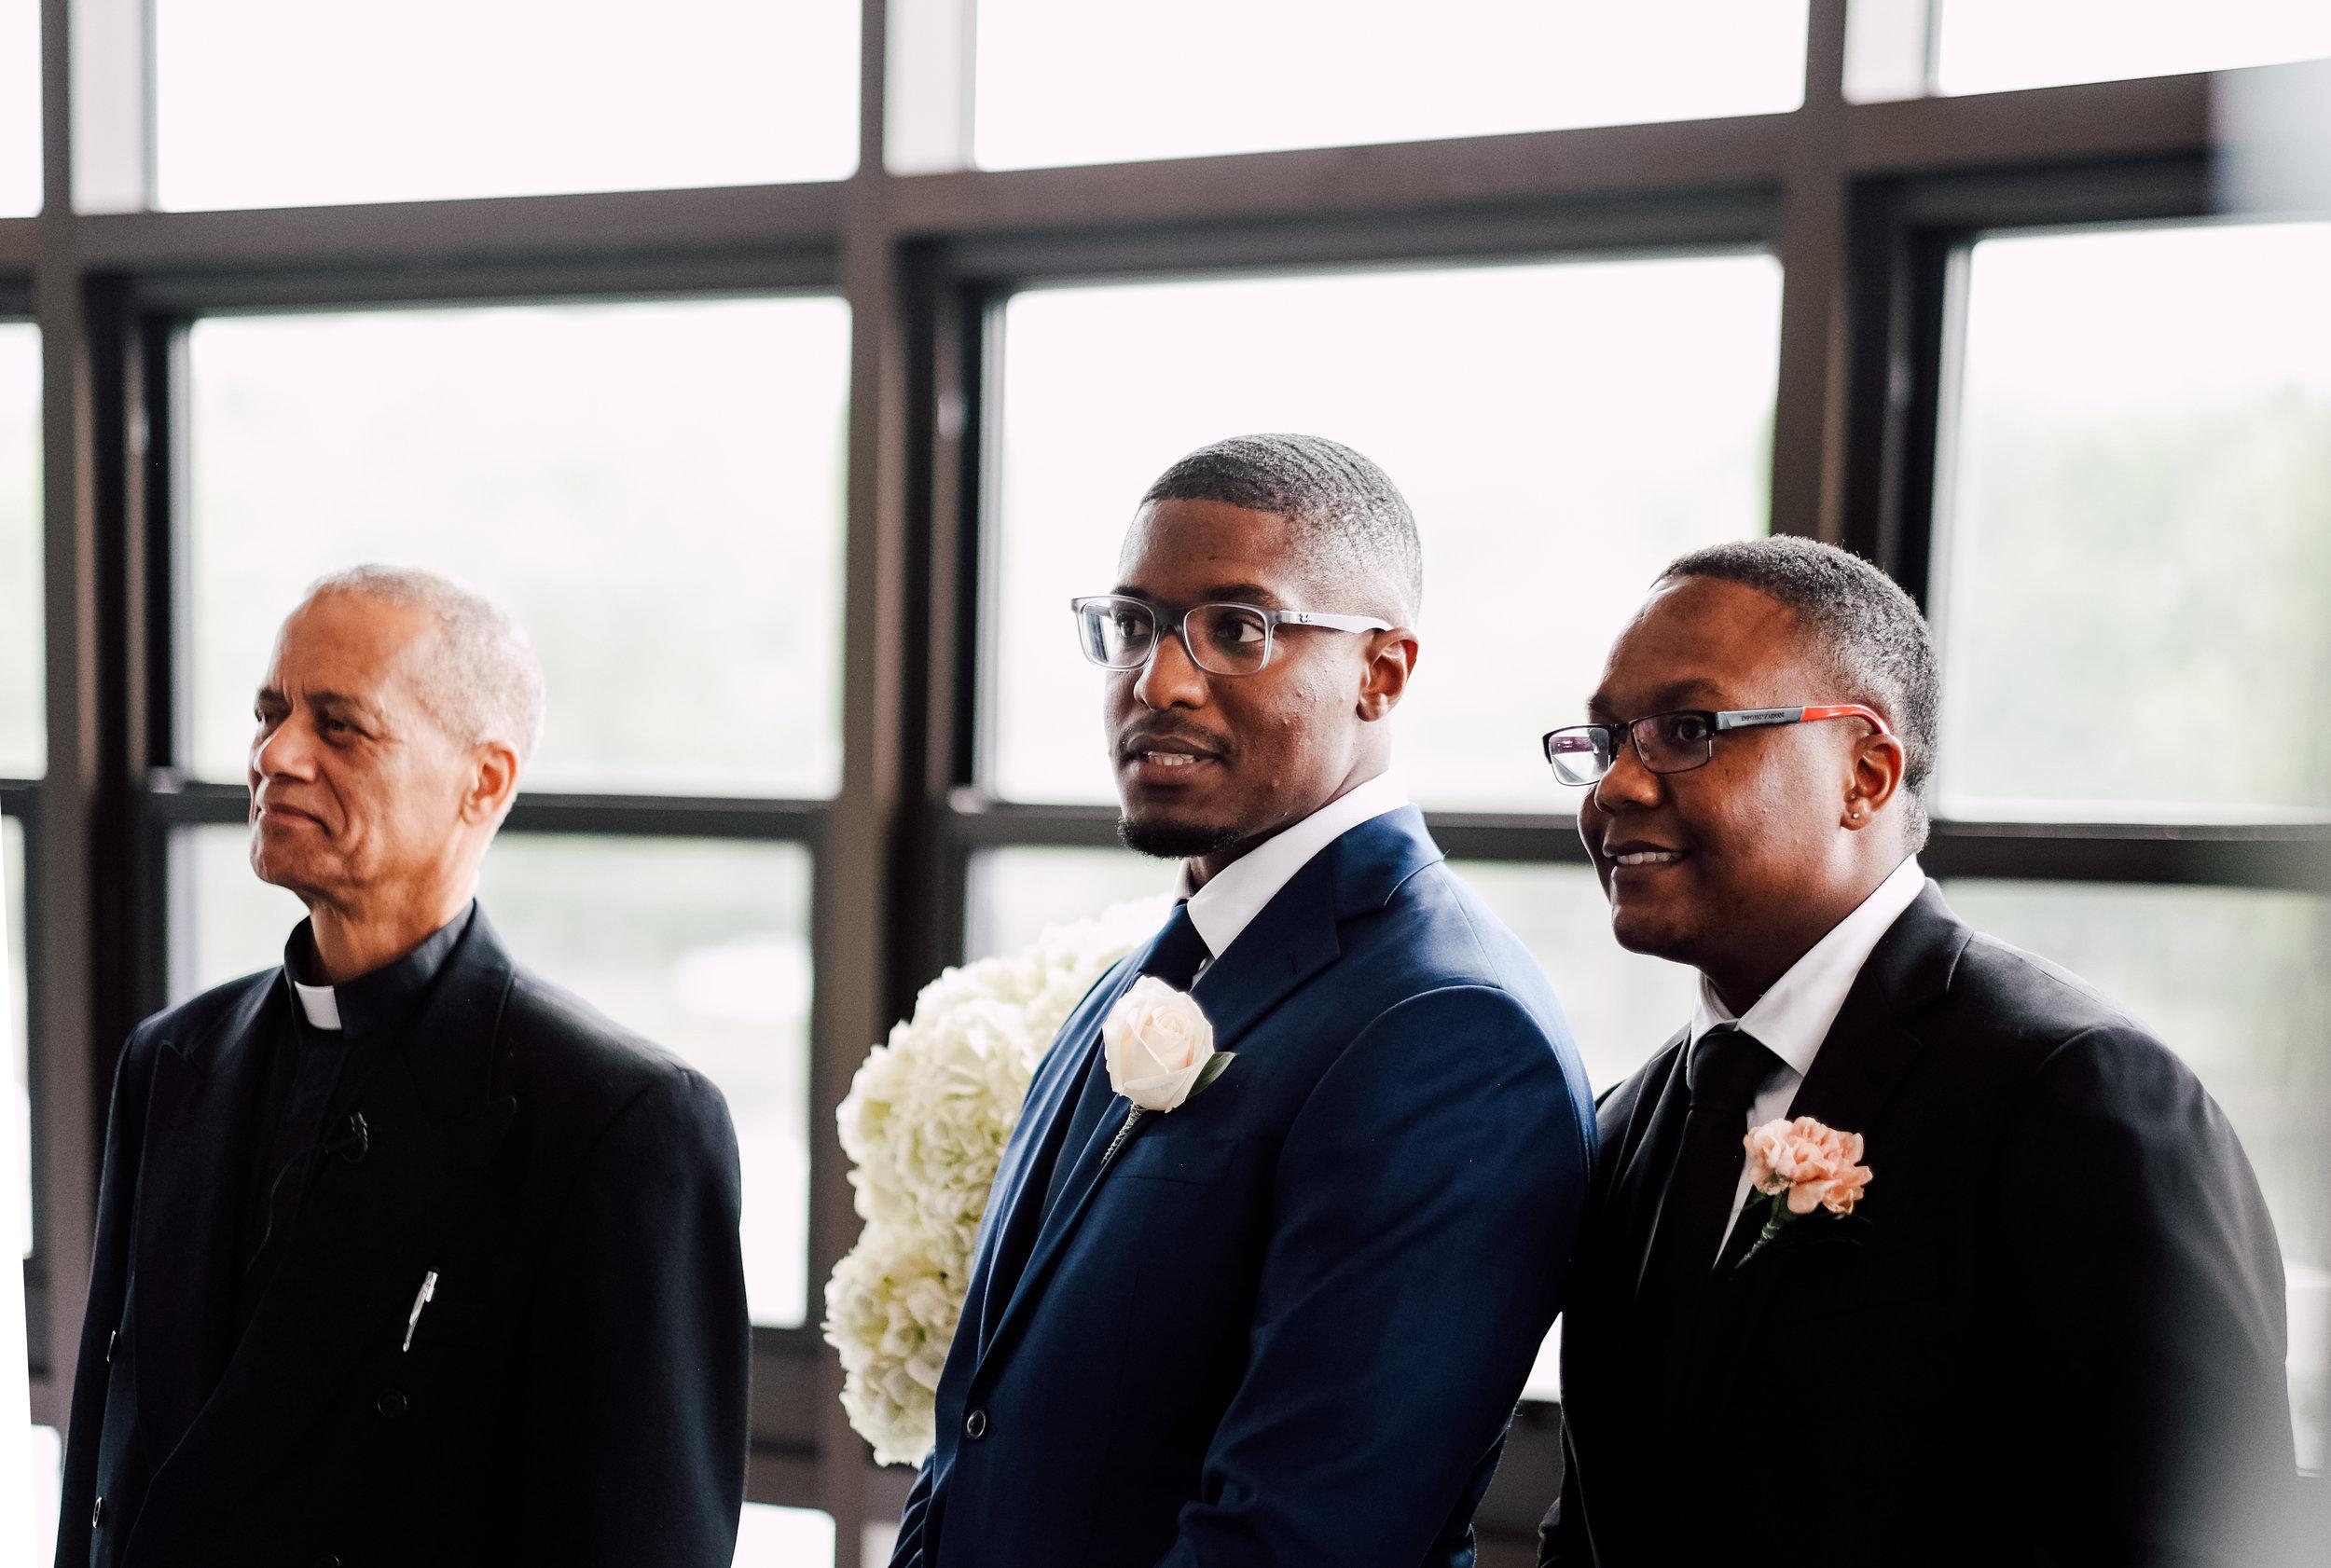 ottawa wedding parliment hills-20.jpg